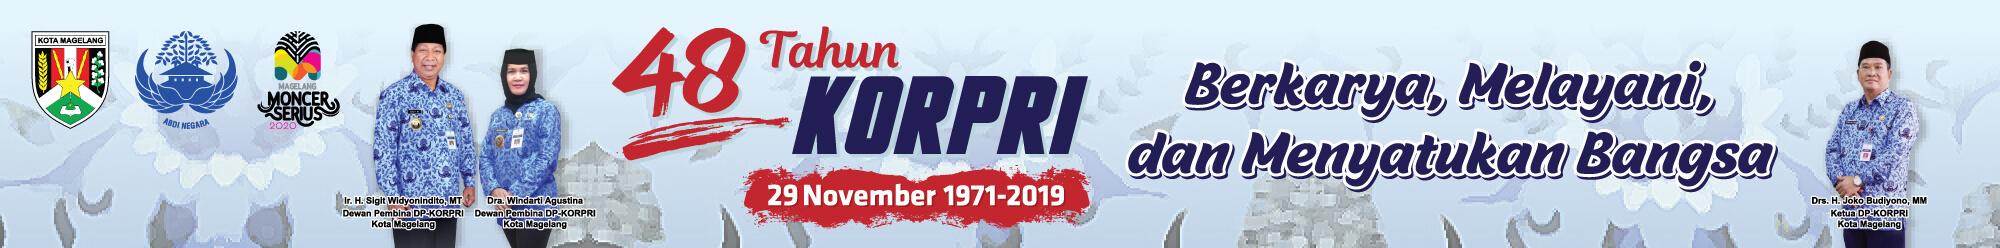 Banner Hari KORPRI